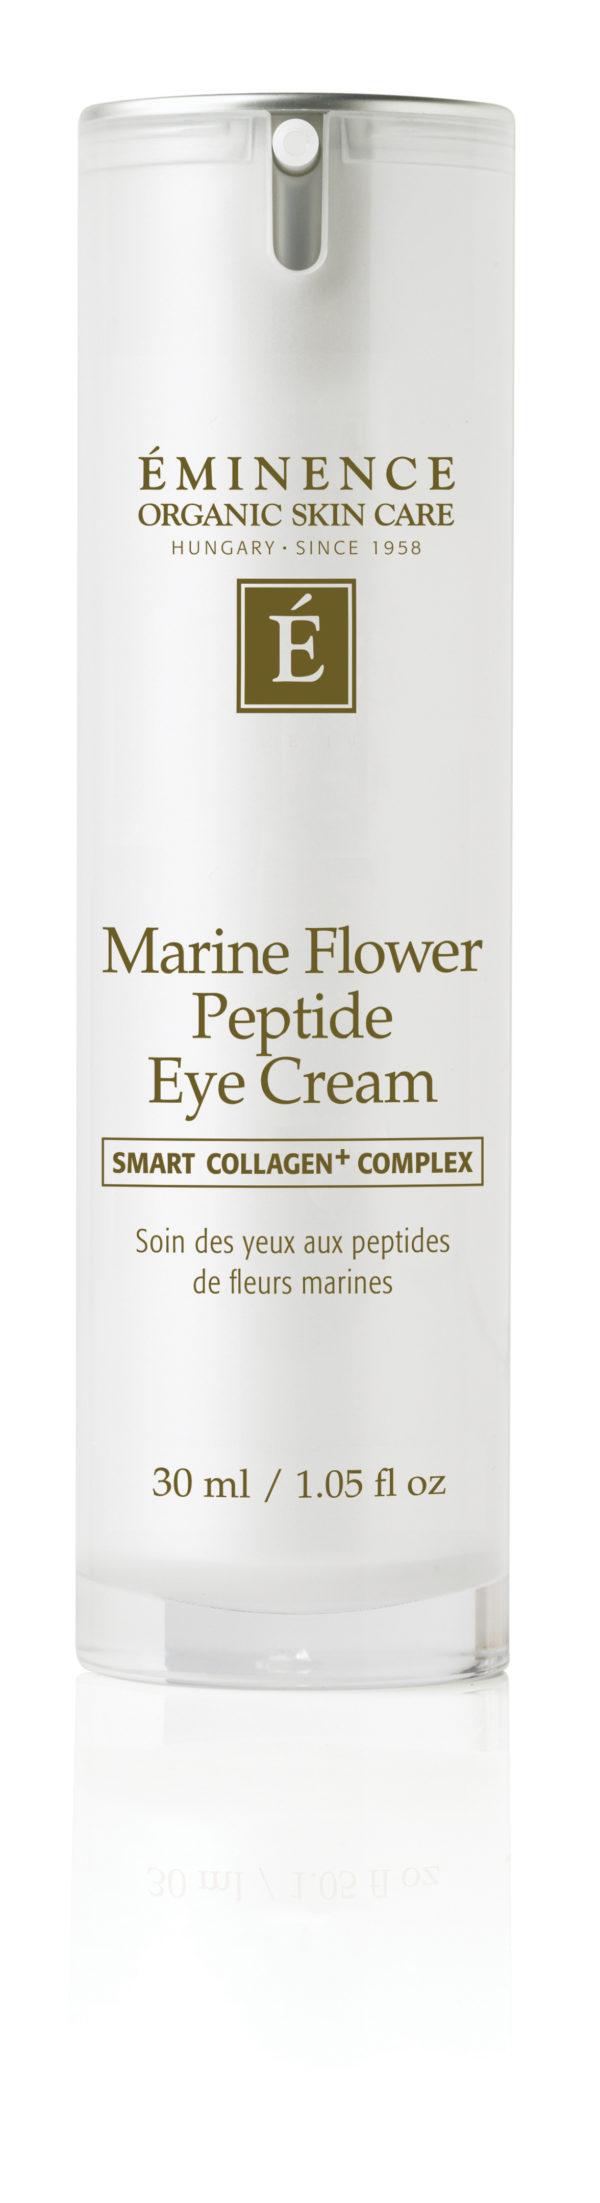 Eminence Marine Flower Peptide Eye Cream